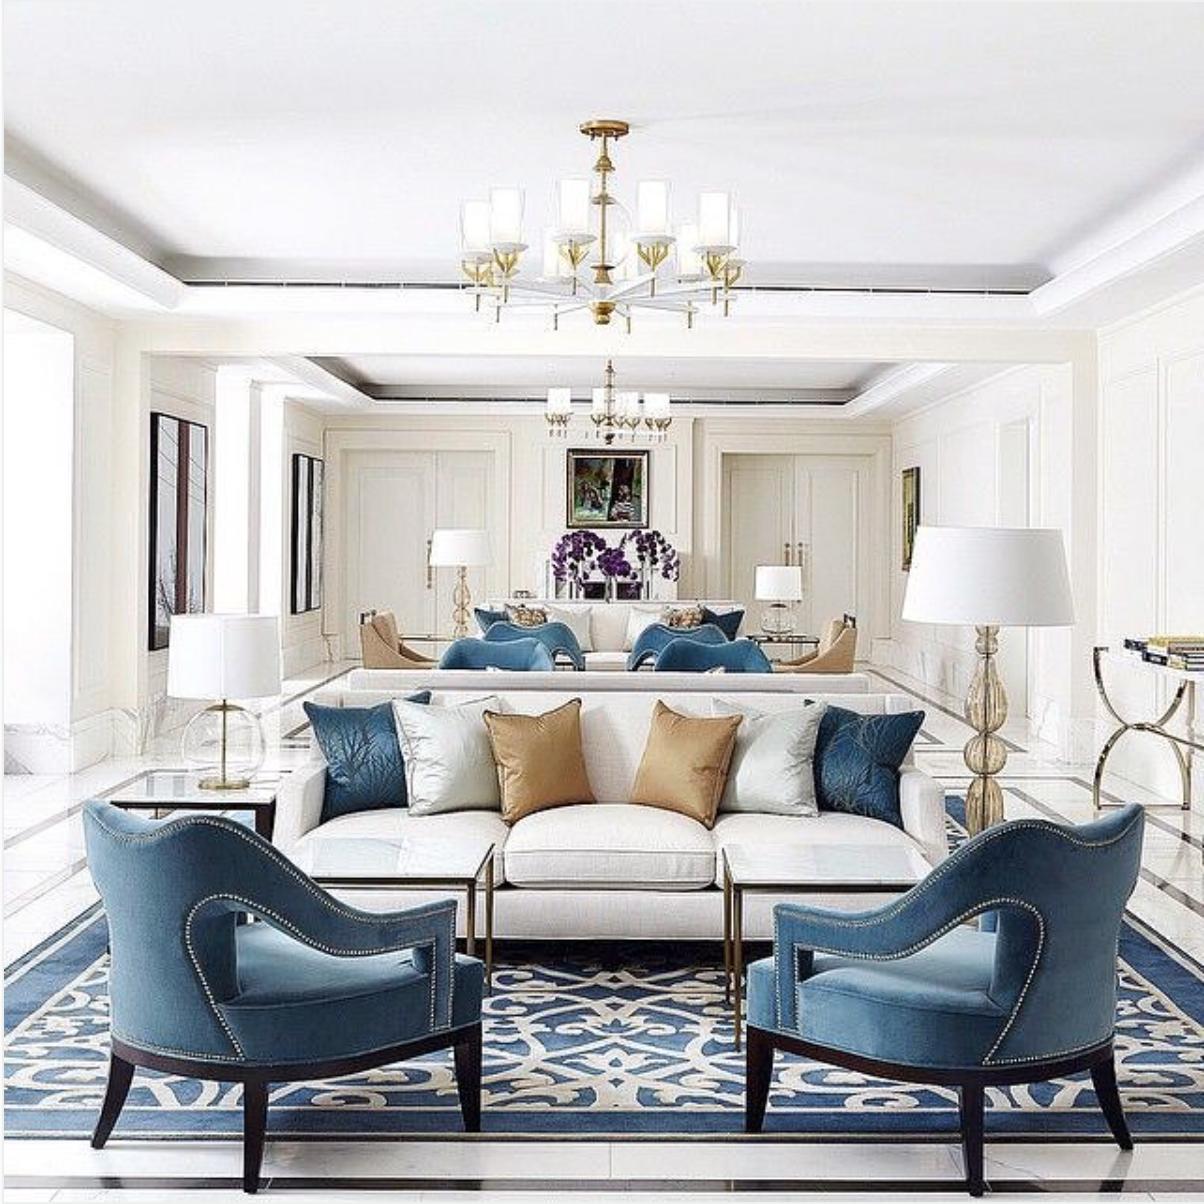 7 Fashionable Modern Sofas For A Chic Living Room Interior Design | Modern  Sofas. Living